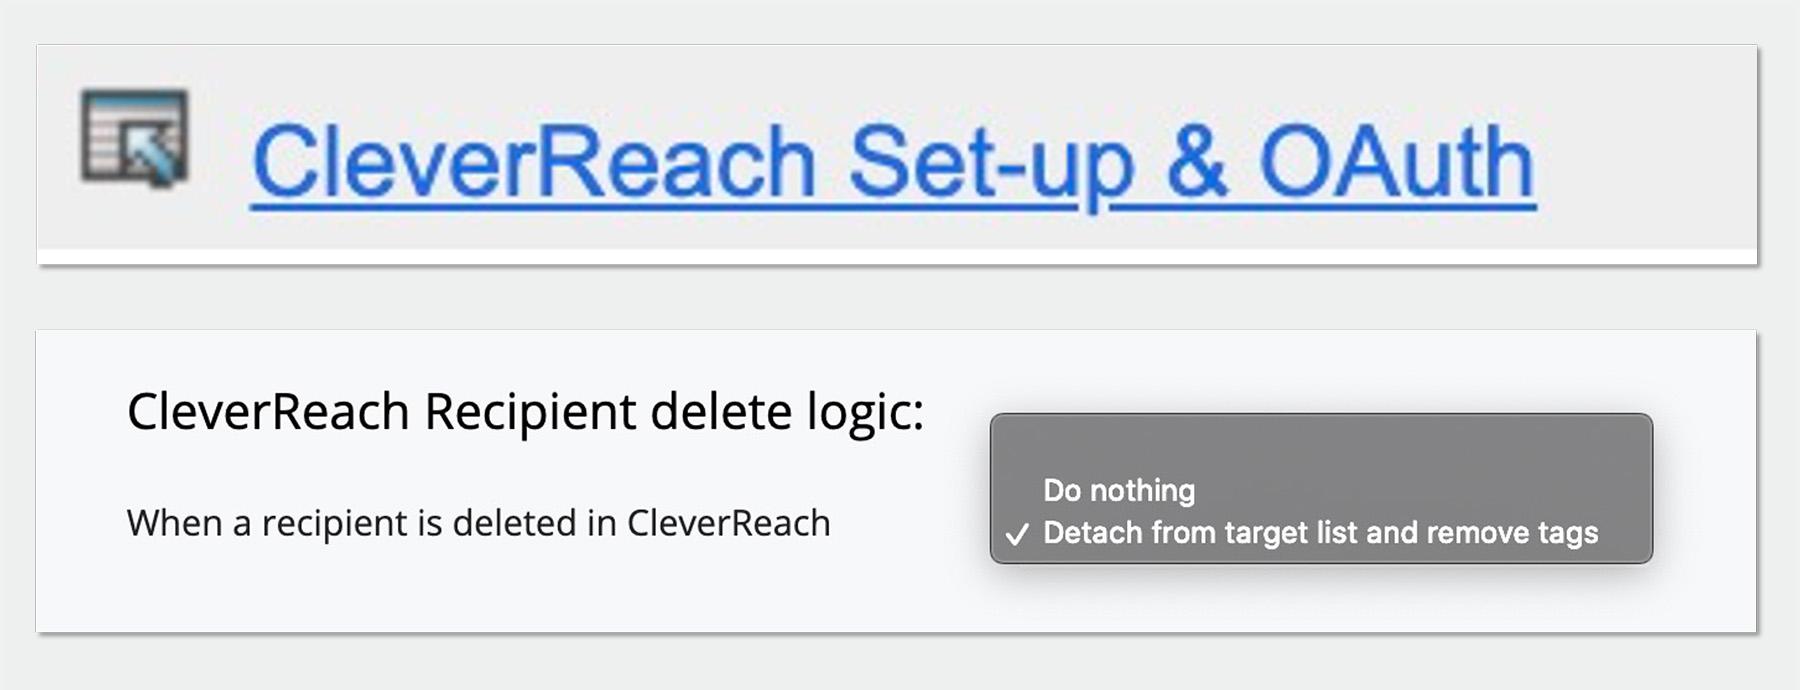 deleted-recipients-logic